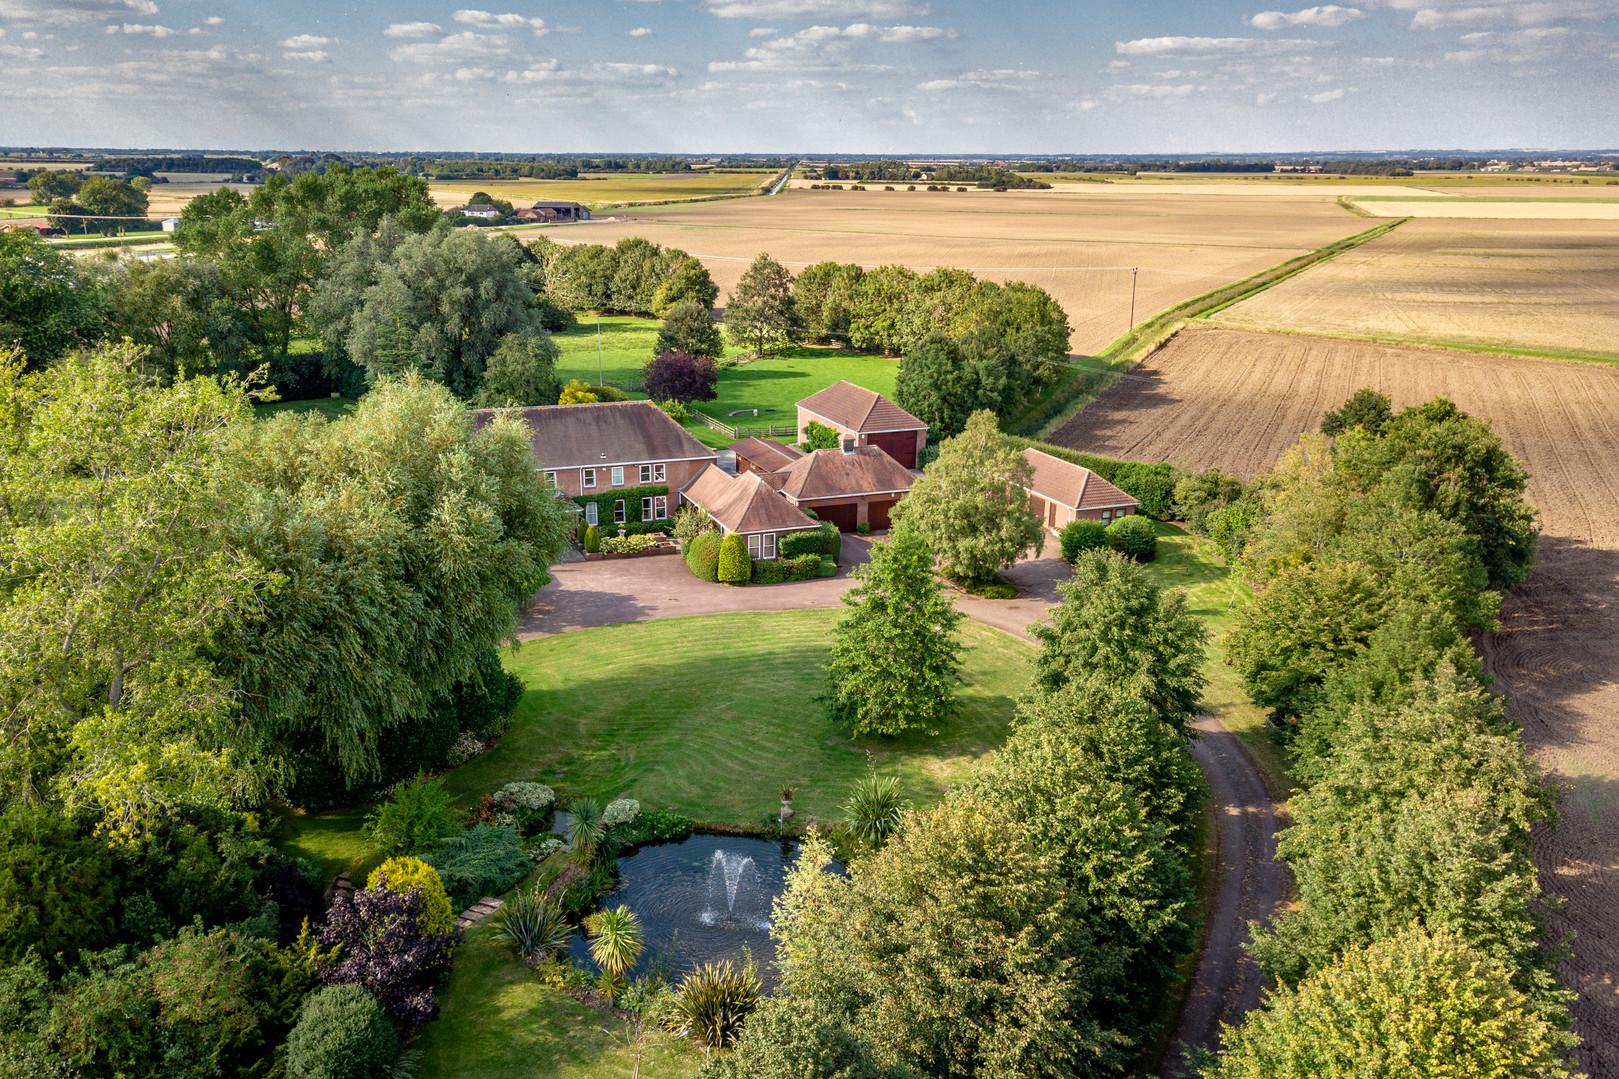 Holland House (Antons Gowt) Aerial-2.jpg